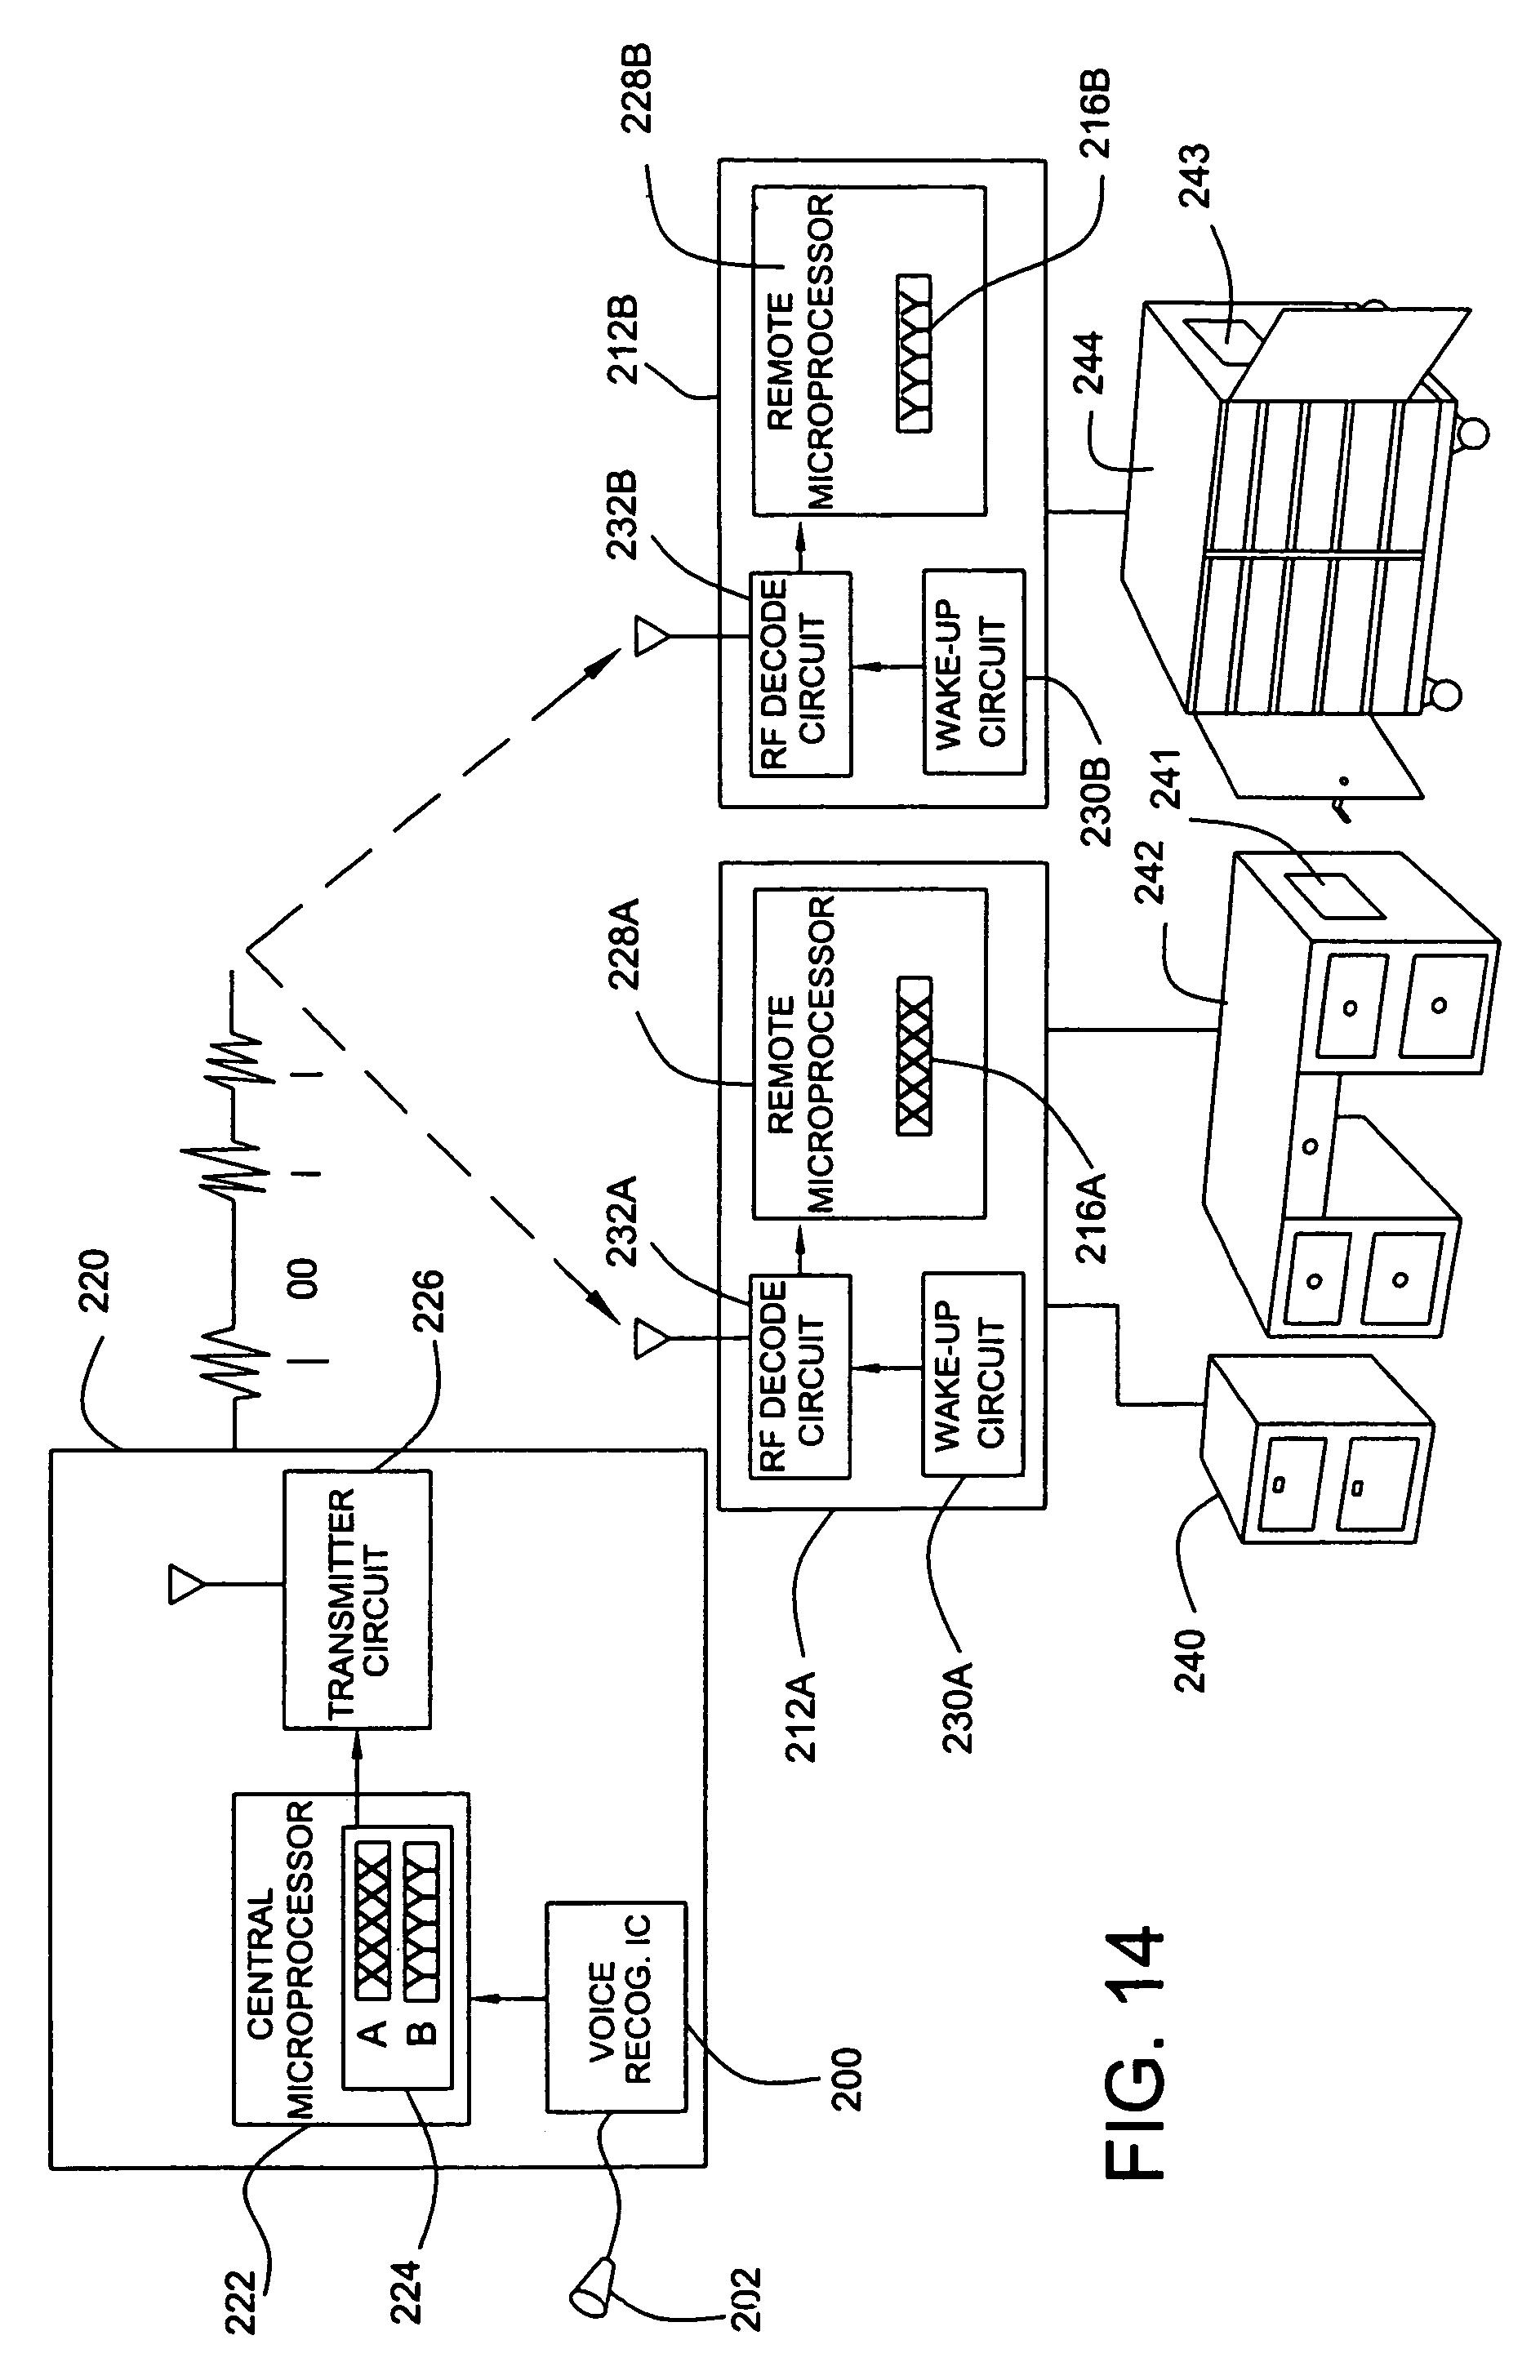 electronic safe wiring diagram wiring diagram. Black Bedroom Furniture Sets. Home Design Ideas